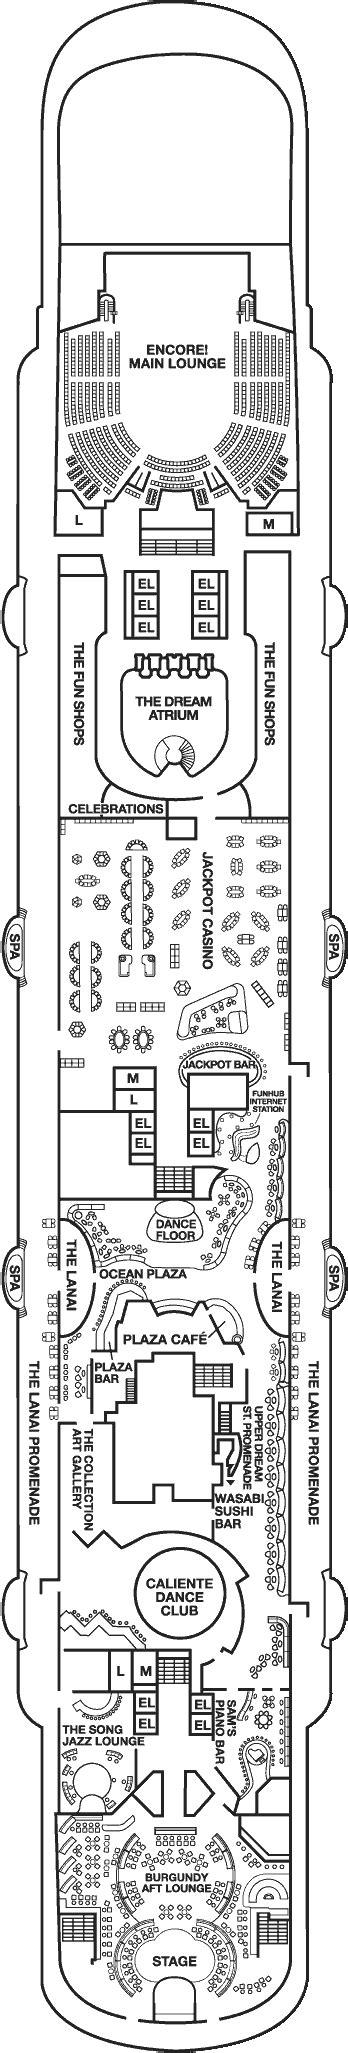 carnival dream deck 10 plan cruisemapper carnival dream deck plans